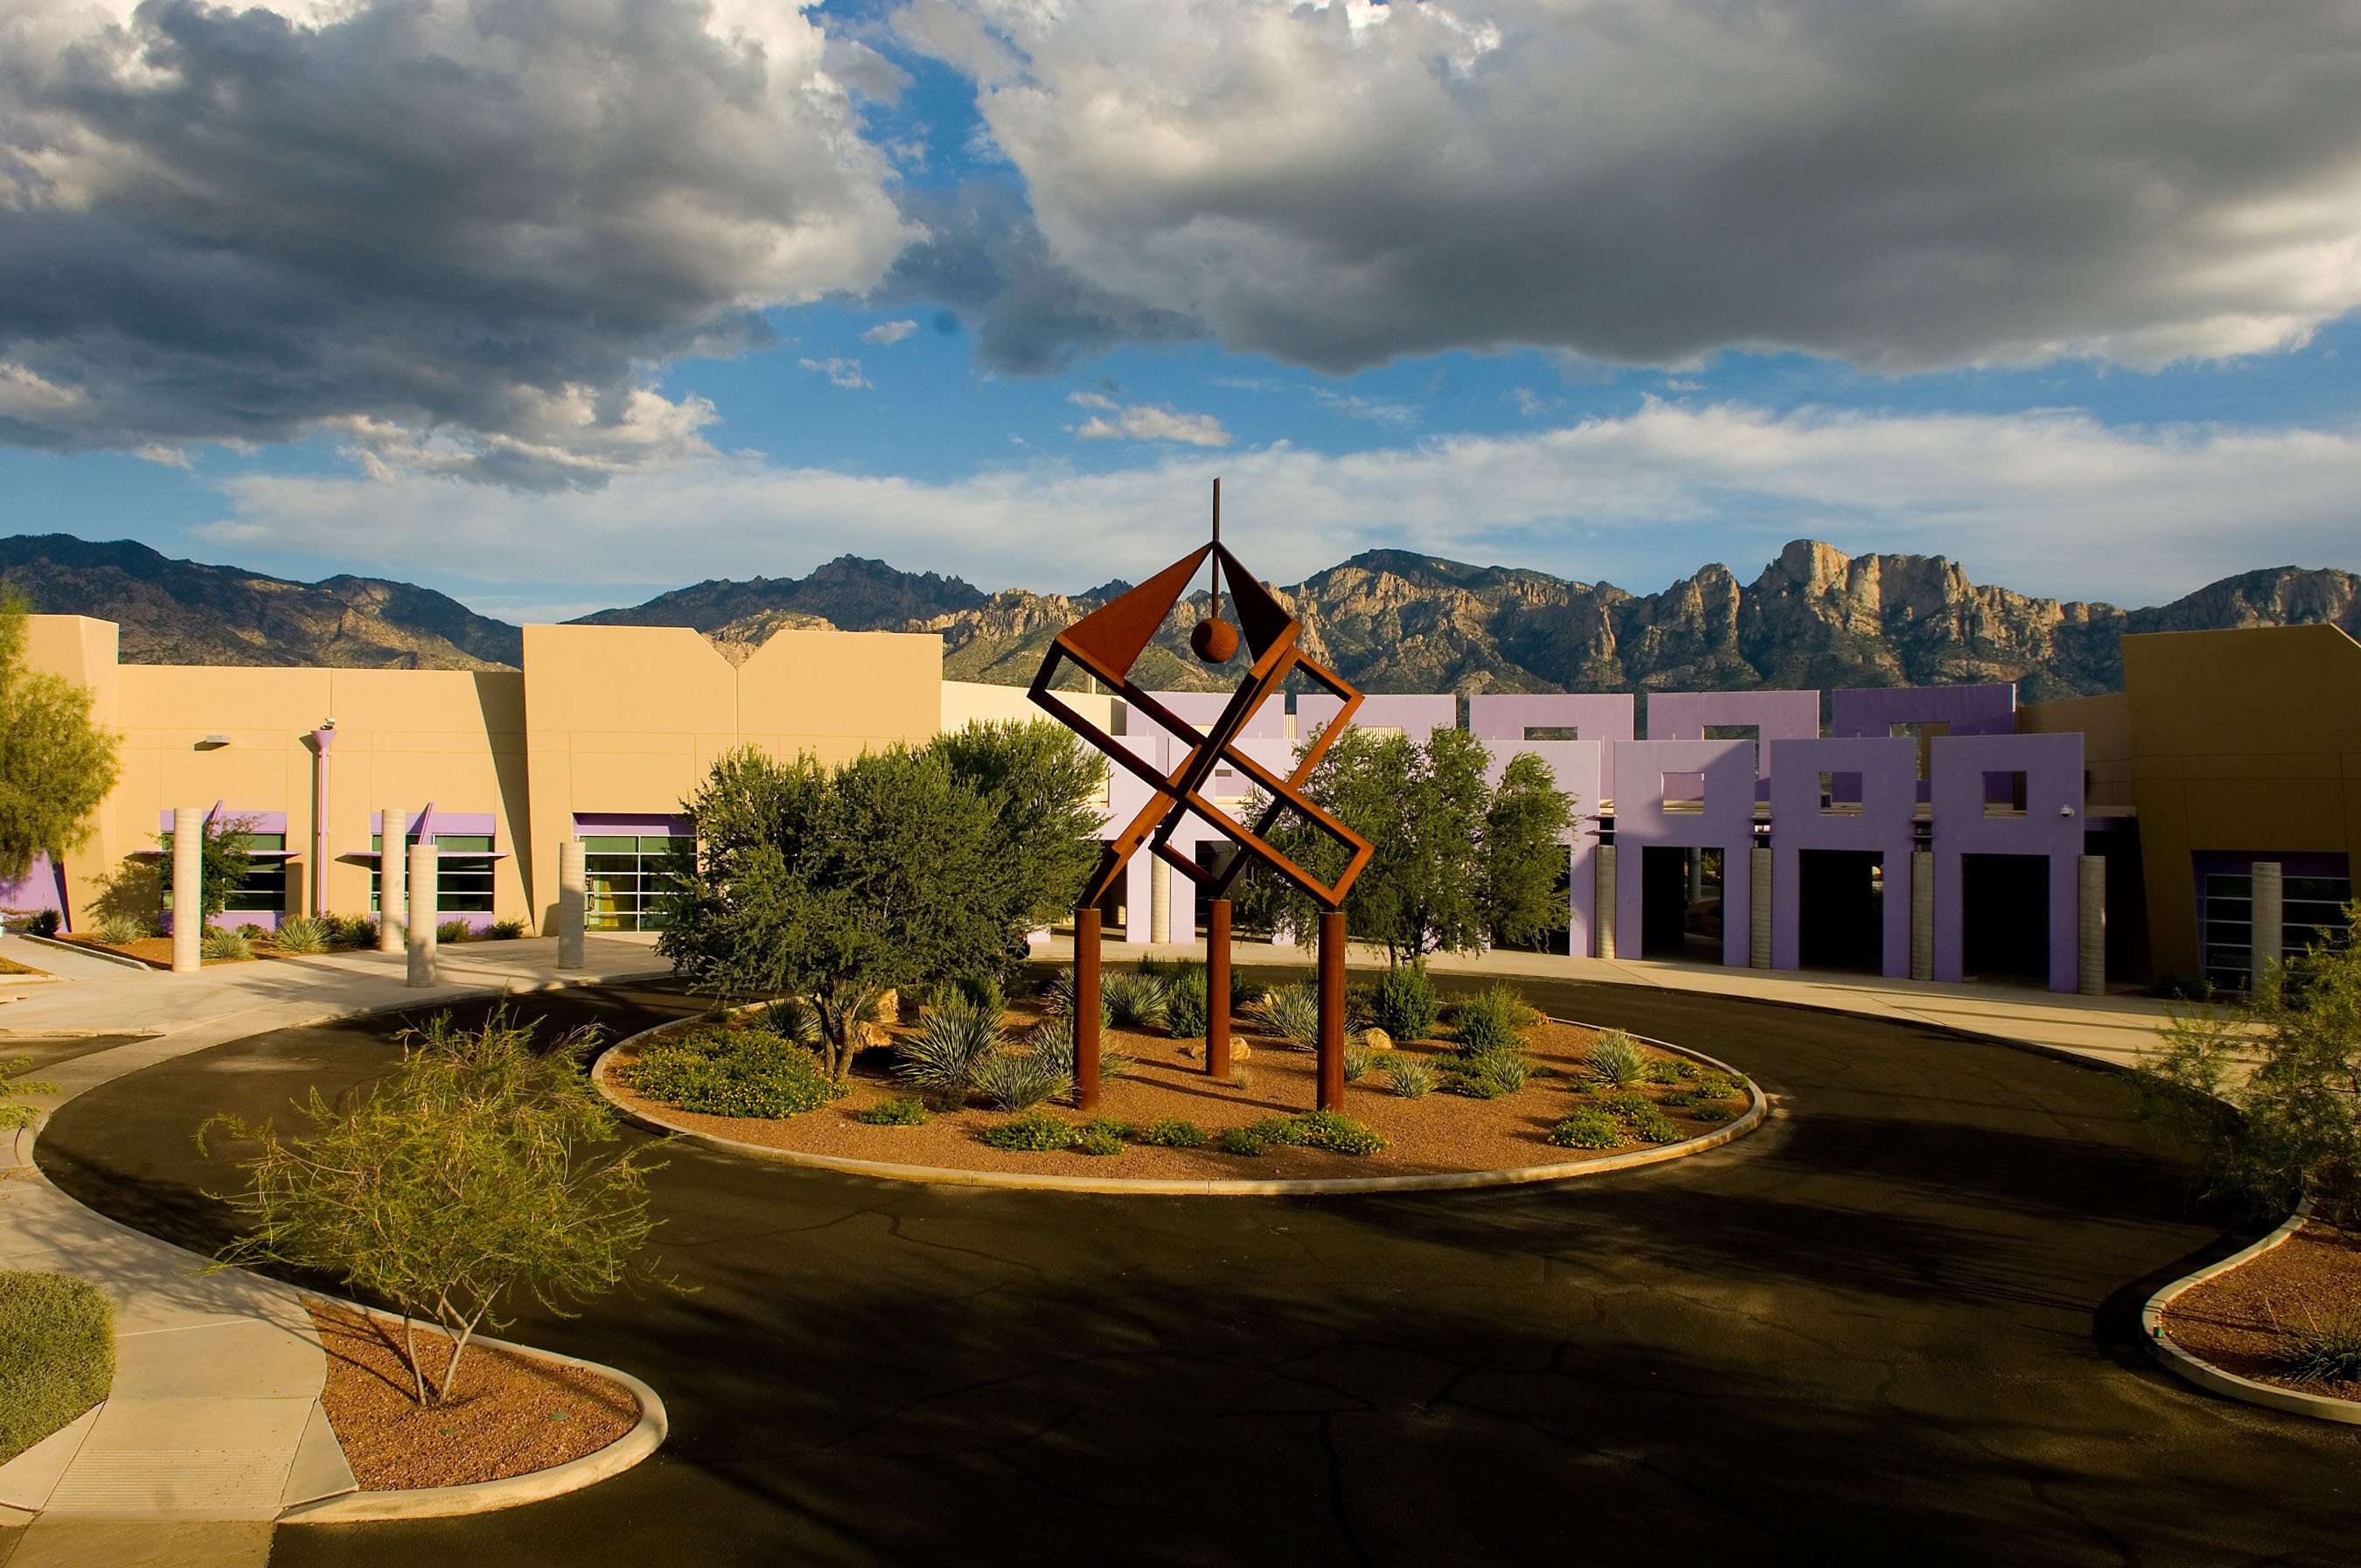 Ventana Medical Systems, Inc., Tucson, Arizona USA. (PRNewsFoto/Ventana Medical Systems, Inc.) (PRNewsFoto/VENTANA MEDICAL SYSTEMS, INC.)